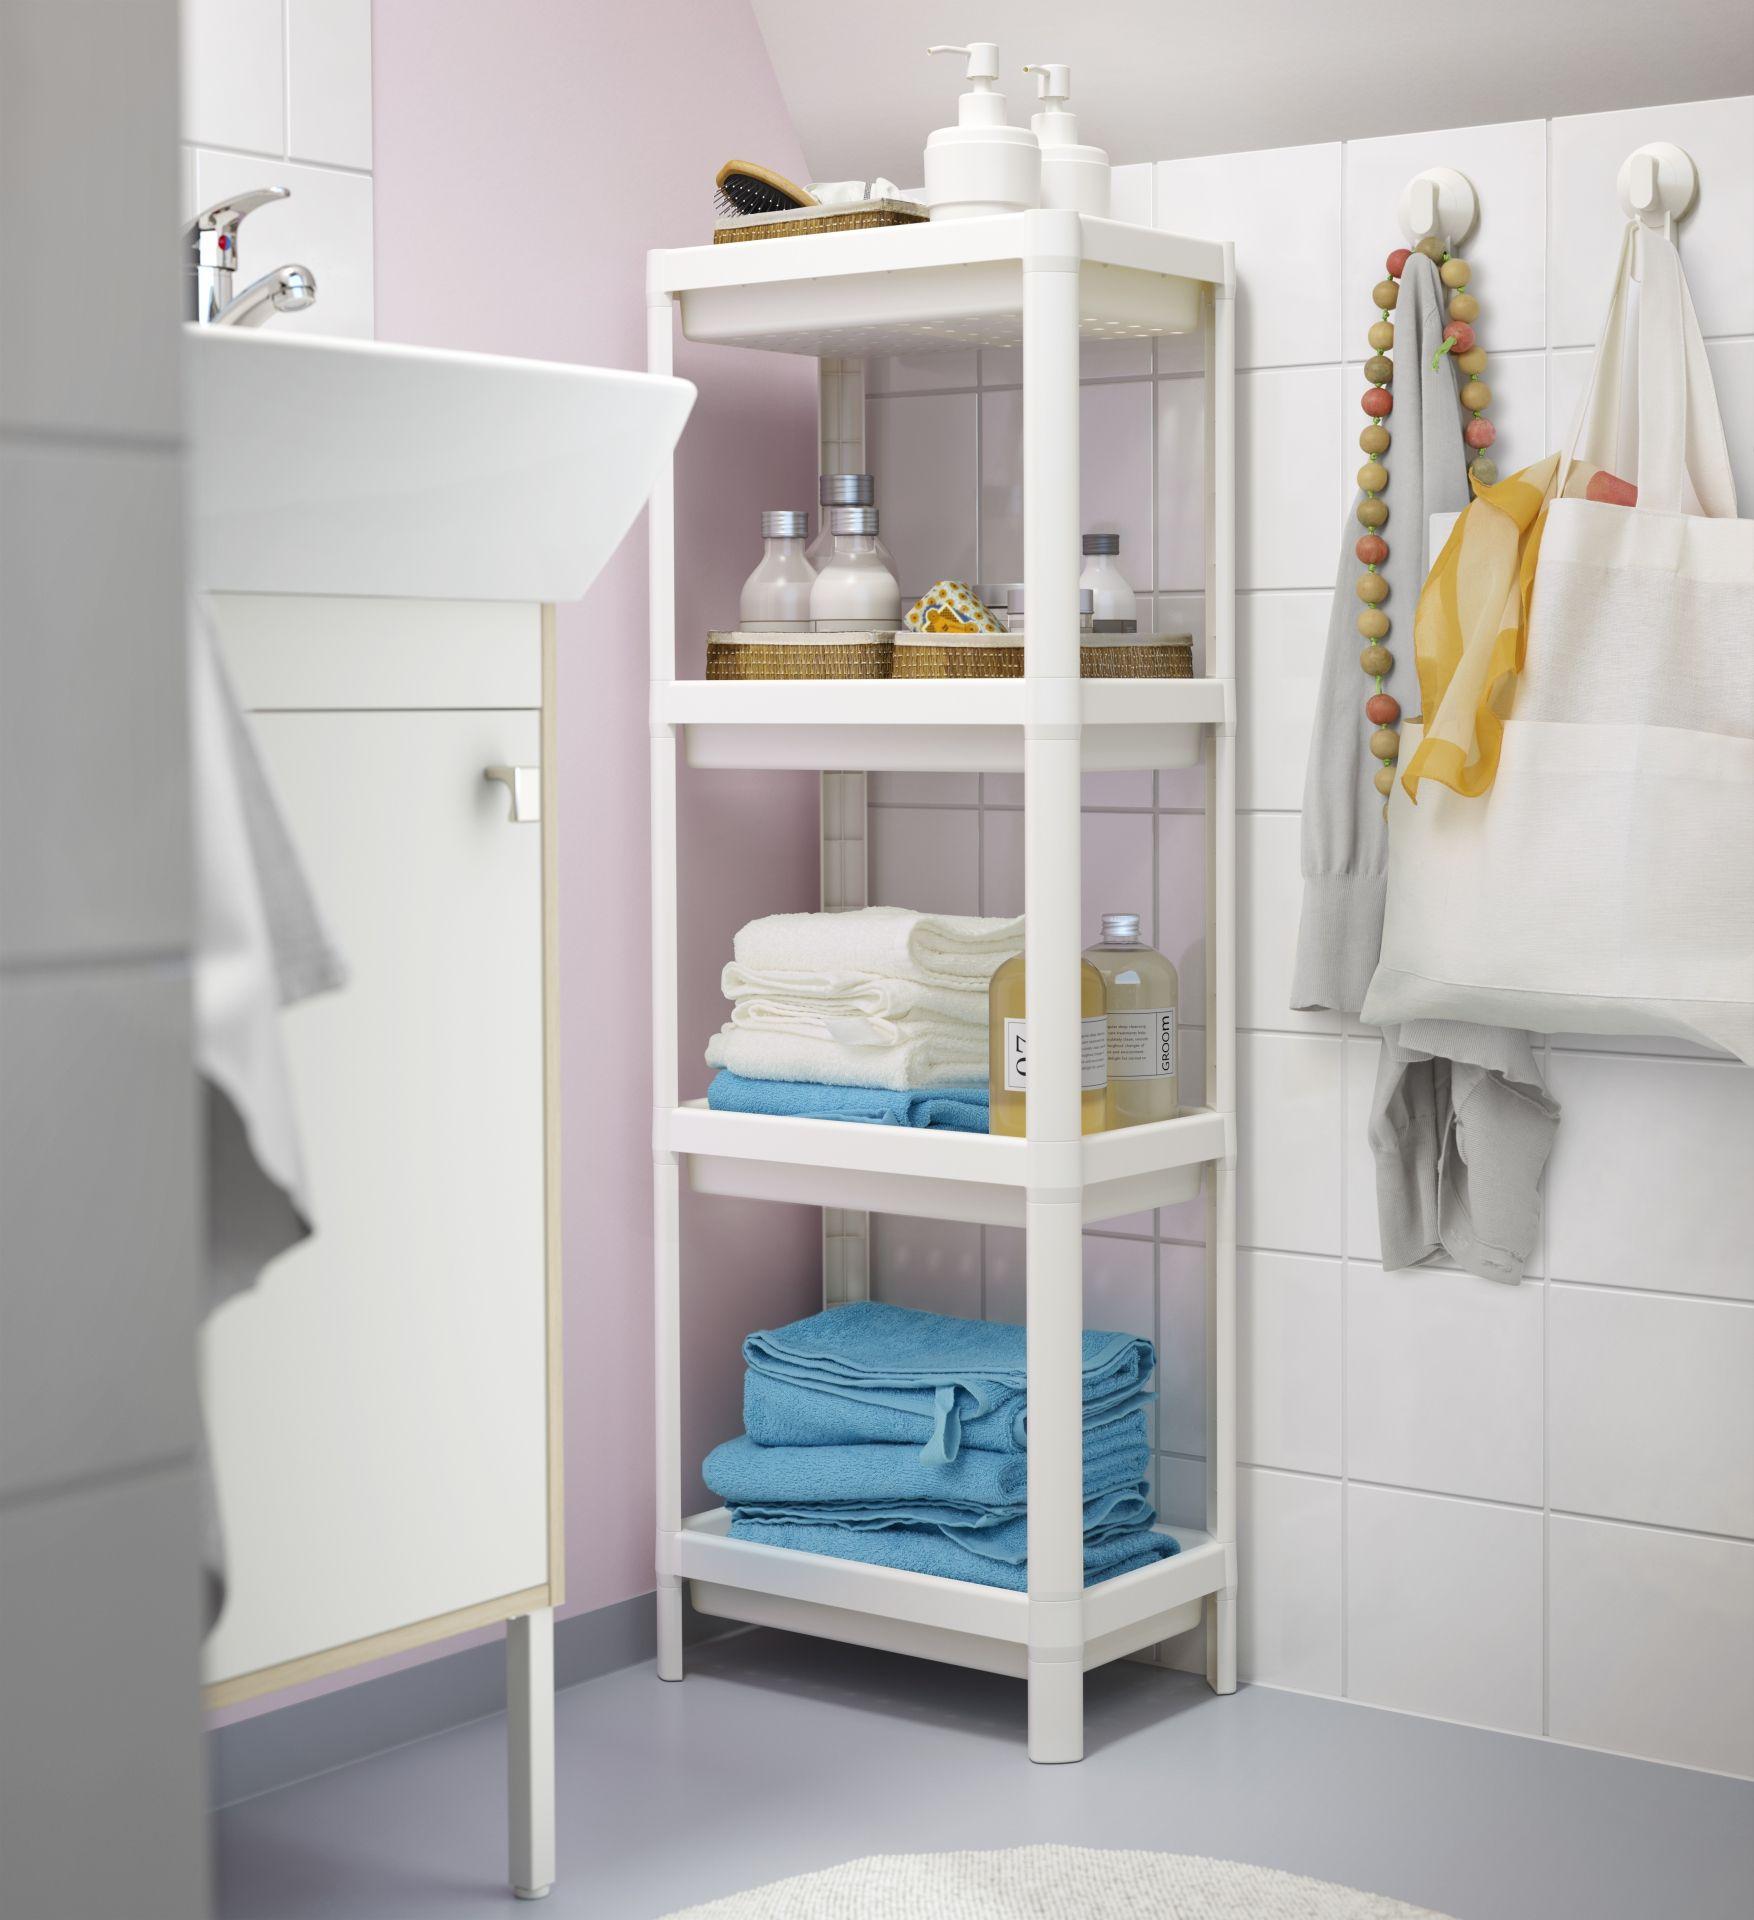 estanterias baño ikea ⭐ ¡PRECIOS Imbatibles 2020!